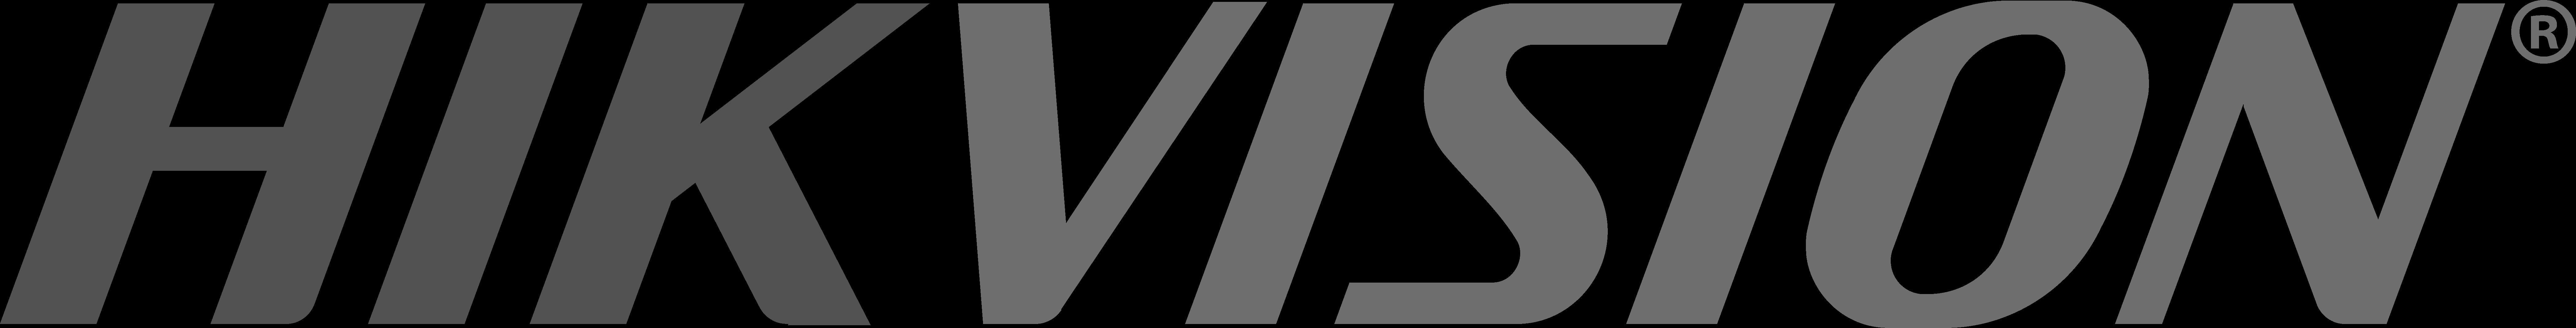 https://0201.nccdn.net/1_2/000/000/13c/05e/hikvision-logo.png